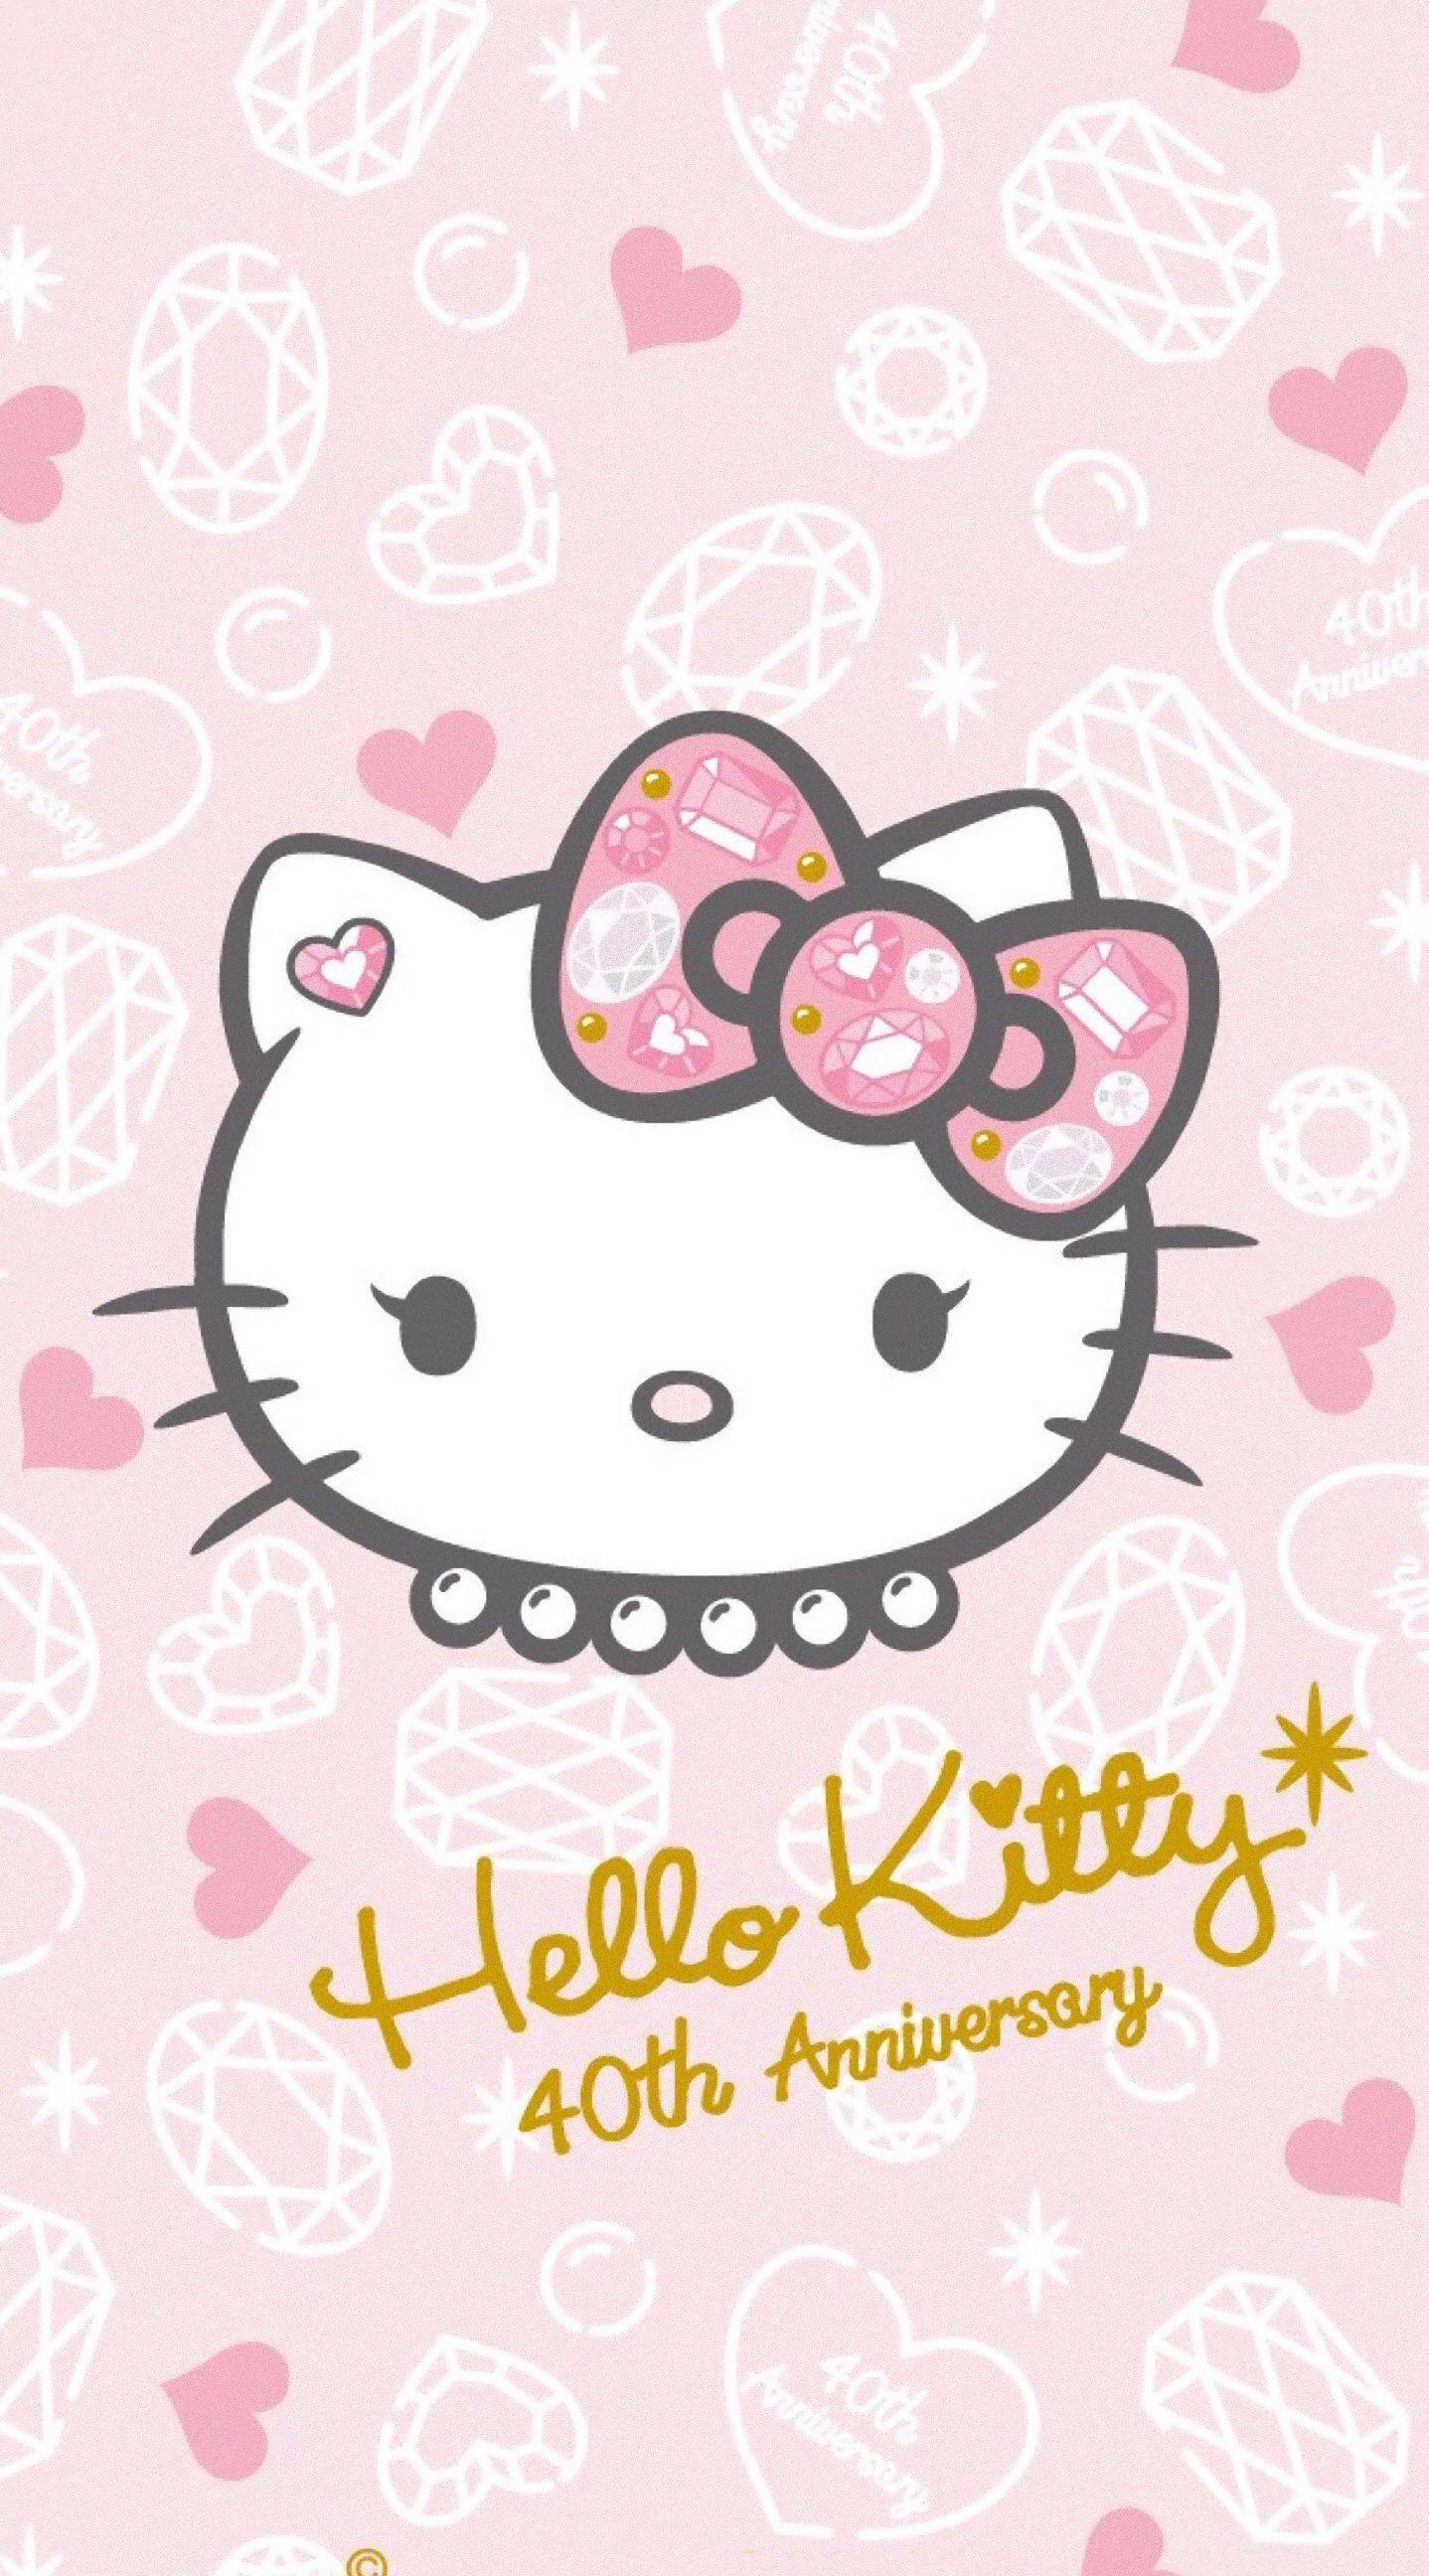 Pin By Chenwenwen On Hello Kitty Hello Kitty Hello Kitty